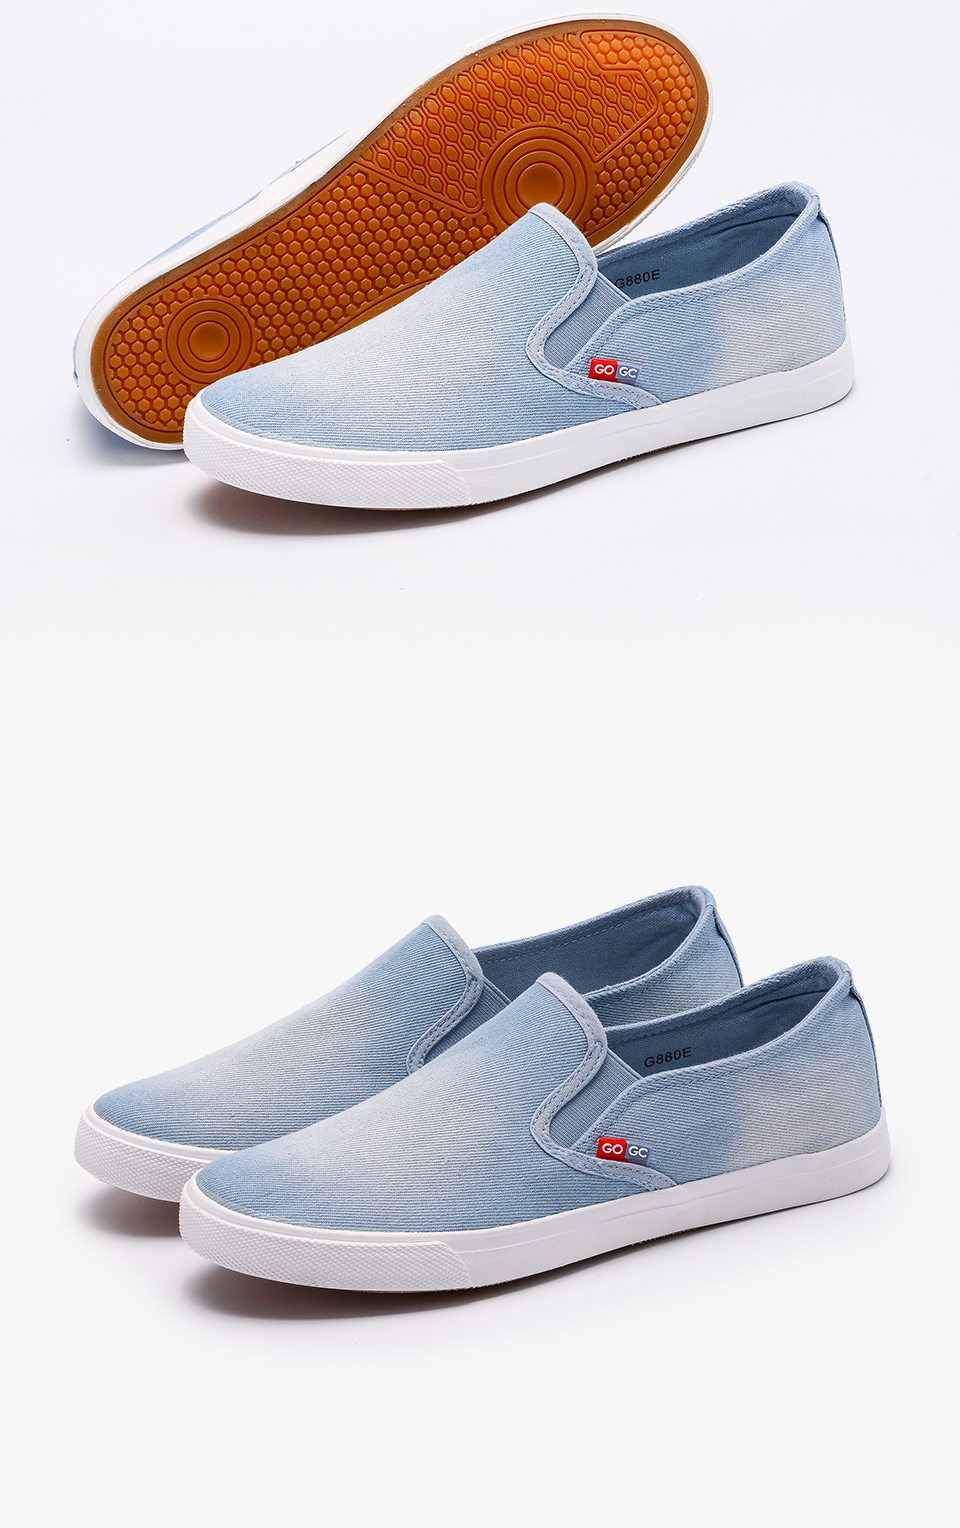 f4916cda7f5e4 GOGC 2017 New Arrival Slipony Men Fashion Men Sneakers Flats Casual Shoes  Denim Canvas Shoes Nice Comfortable Men Shoes Loafers